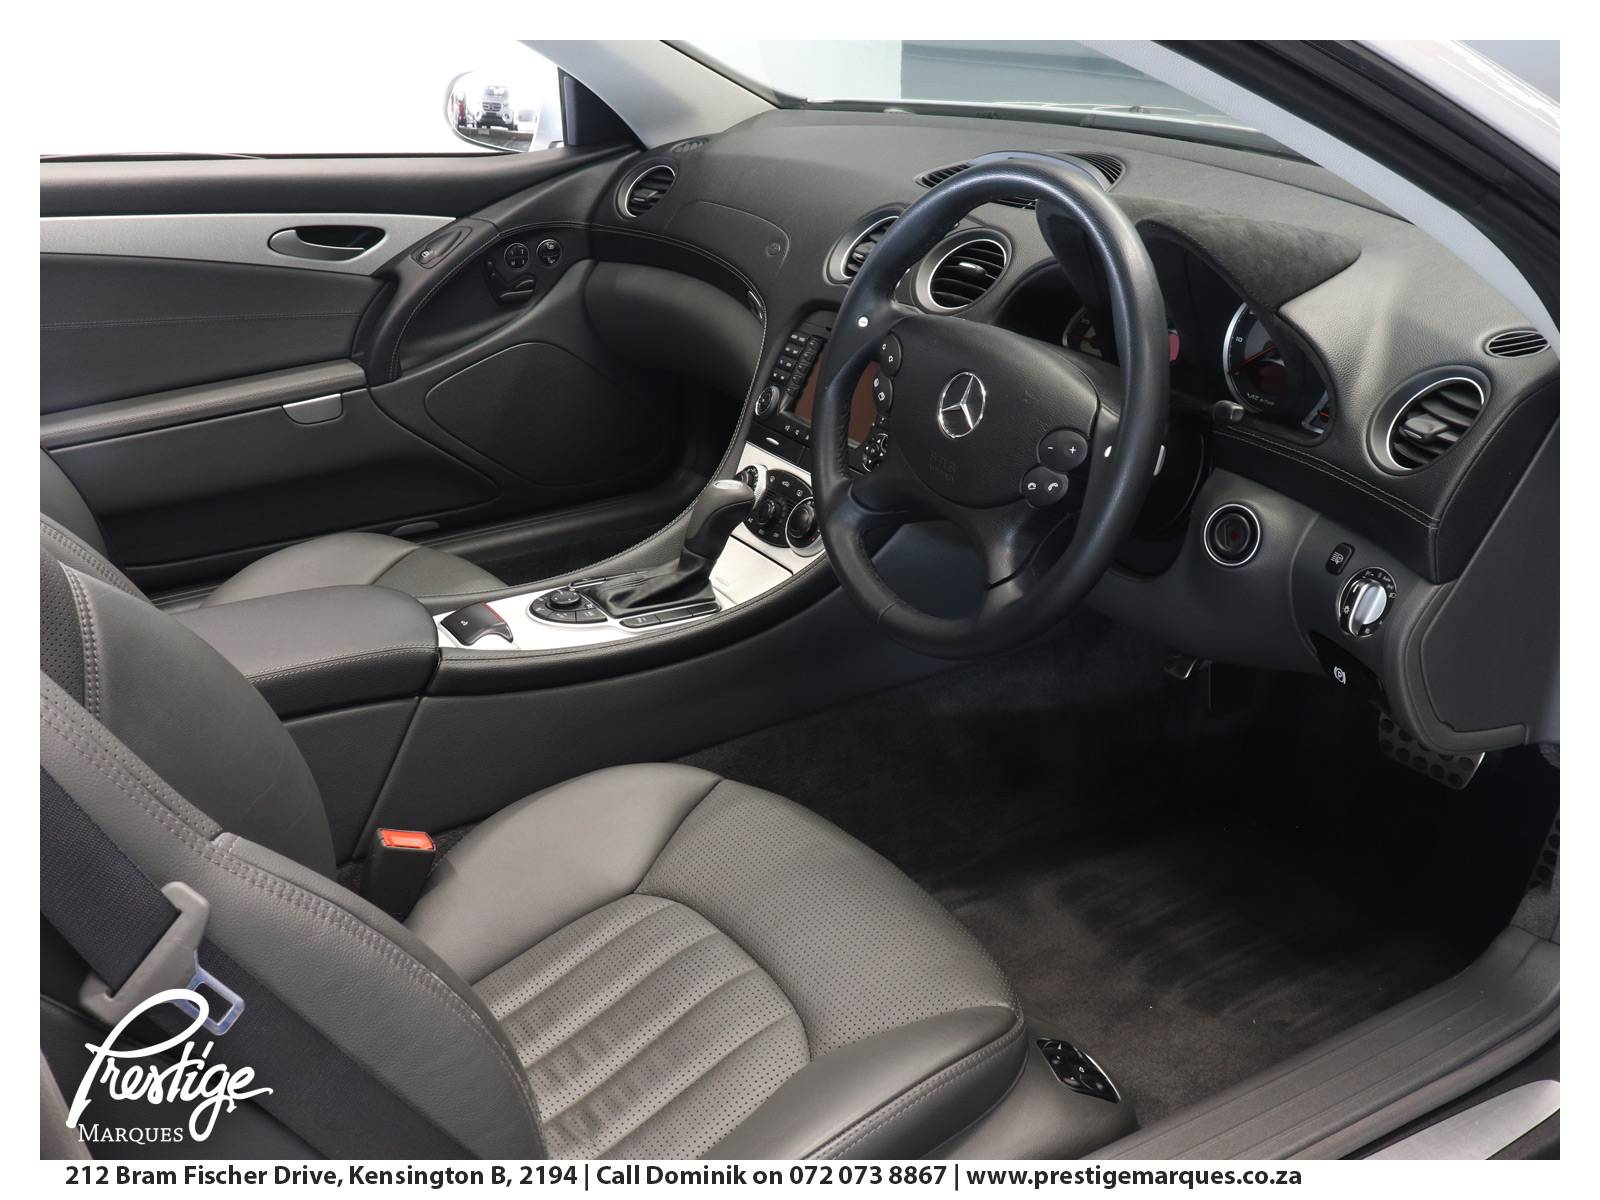 2006-Mercedes-Benz-SL65-AMG-Prestige-Marques-Randburg-Sandton-16